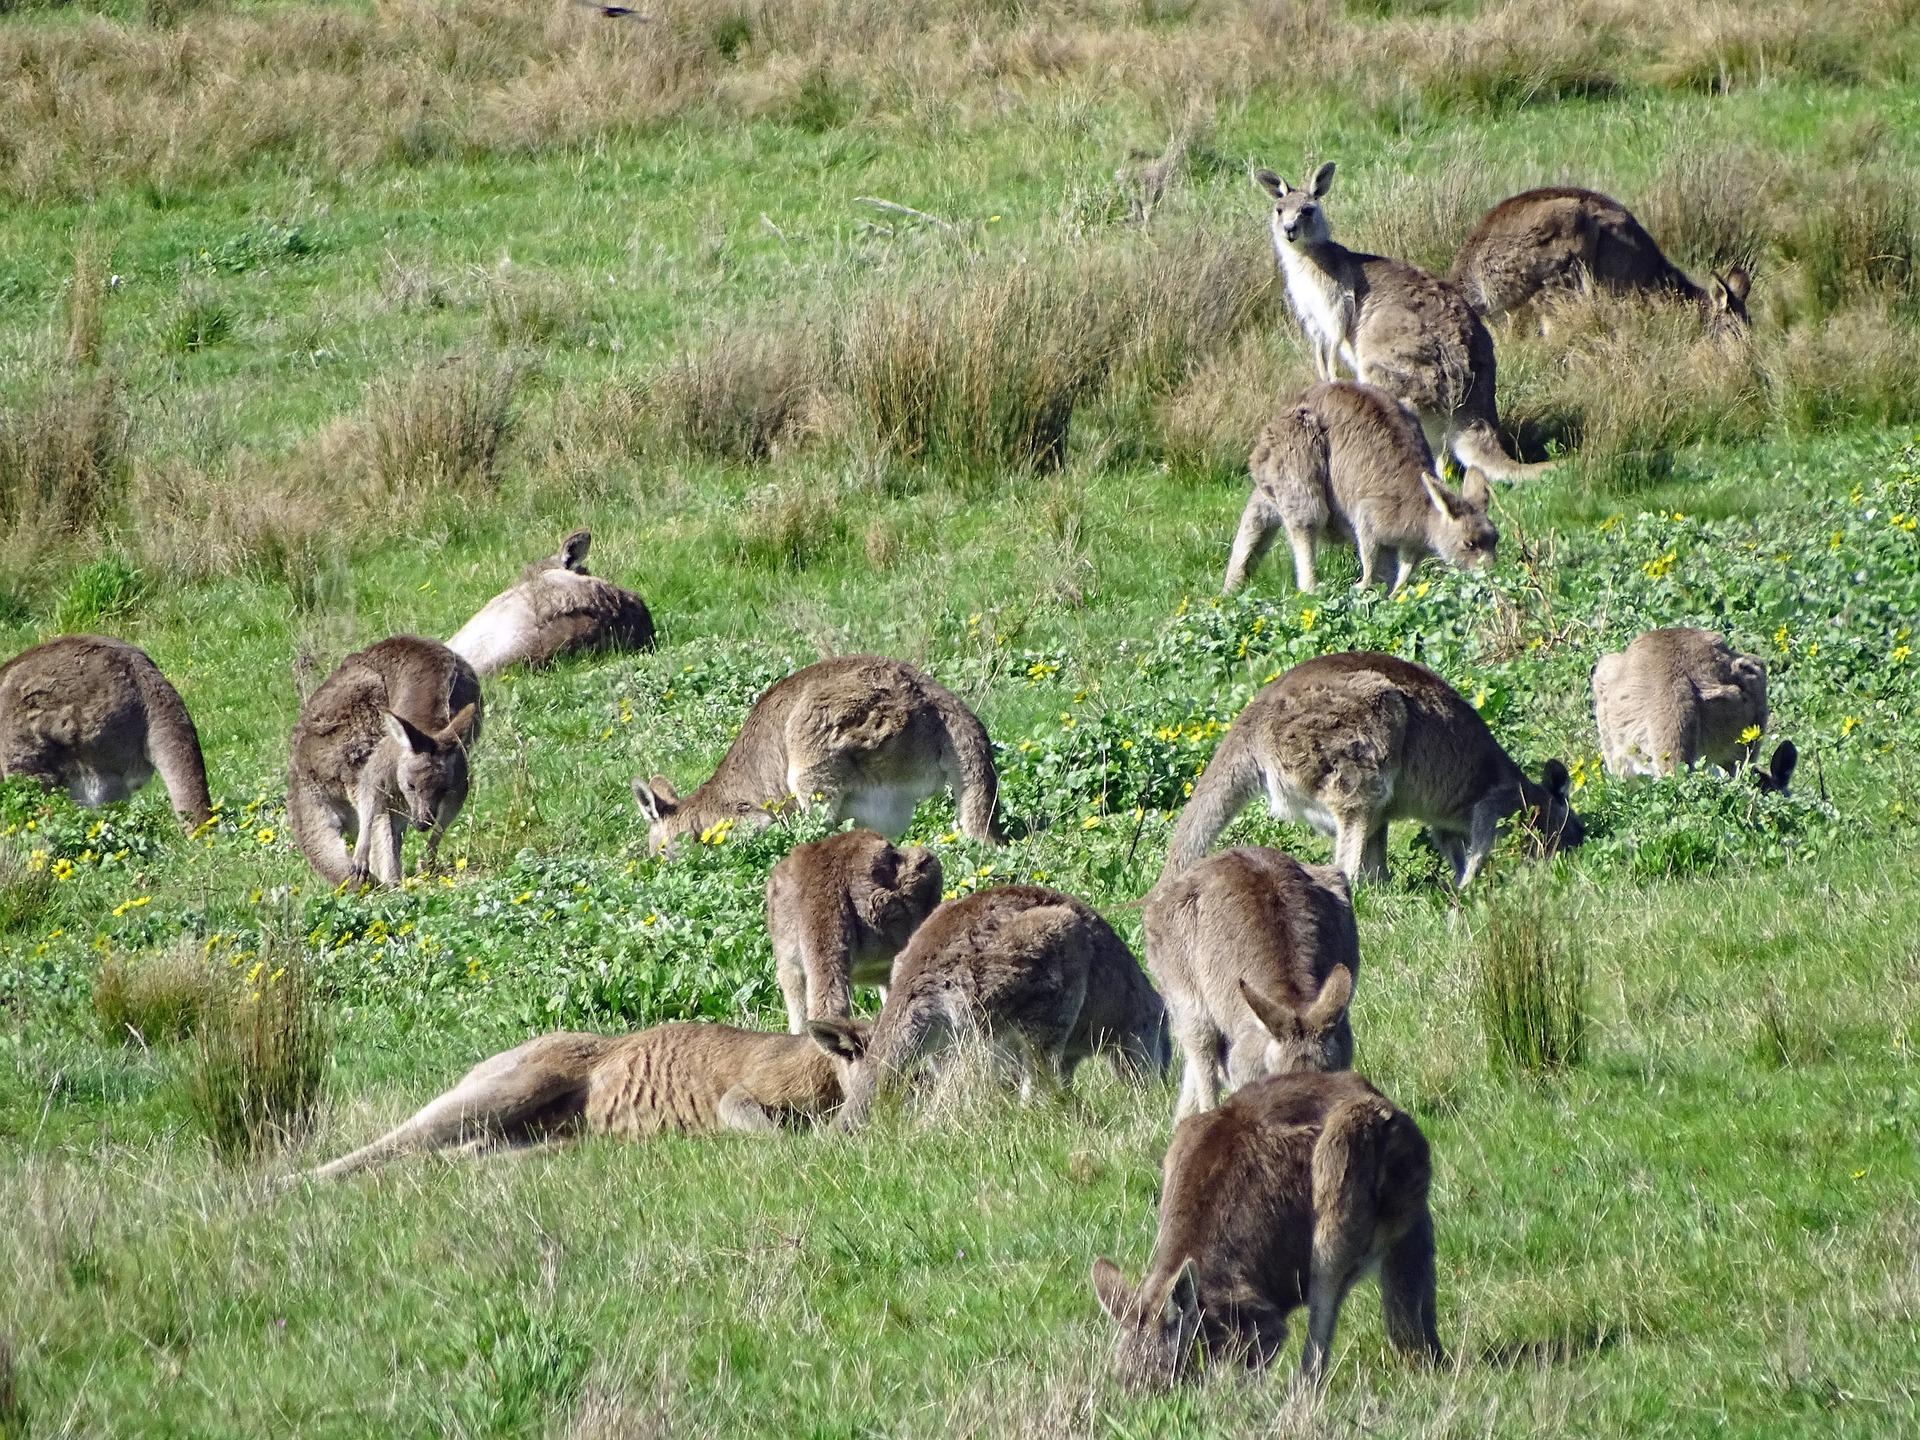 kangaroo-2765233_1920